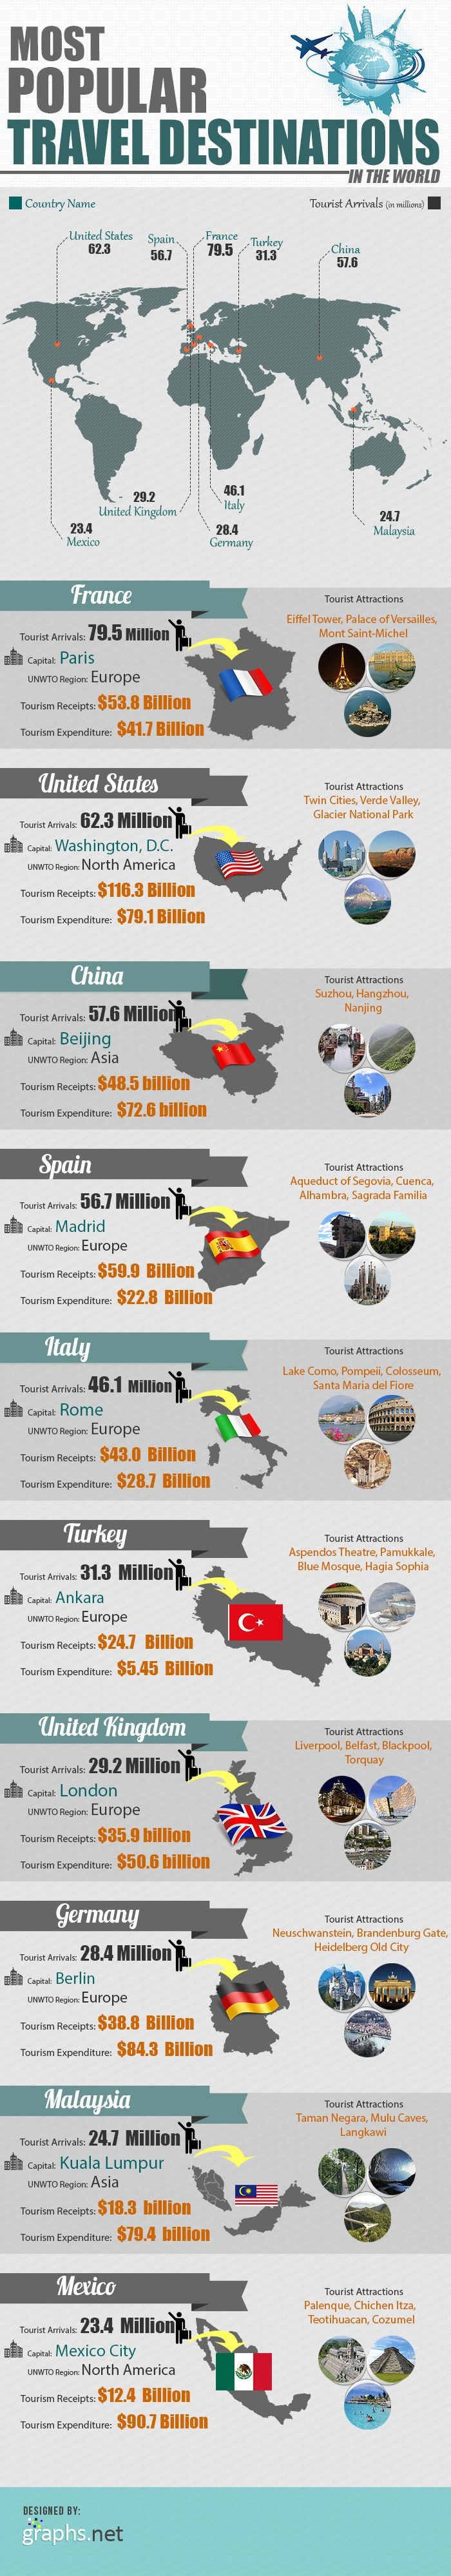 Most popular holiday destinations